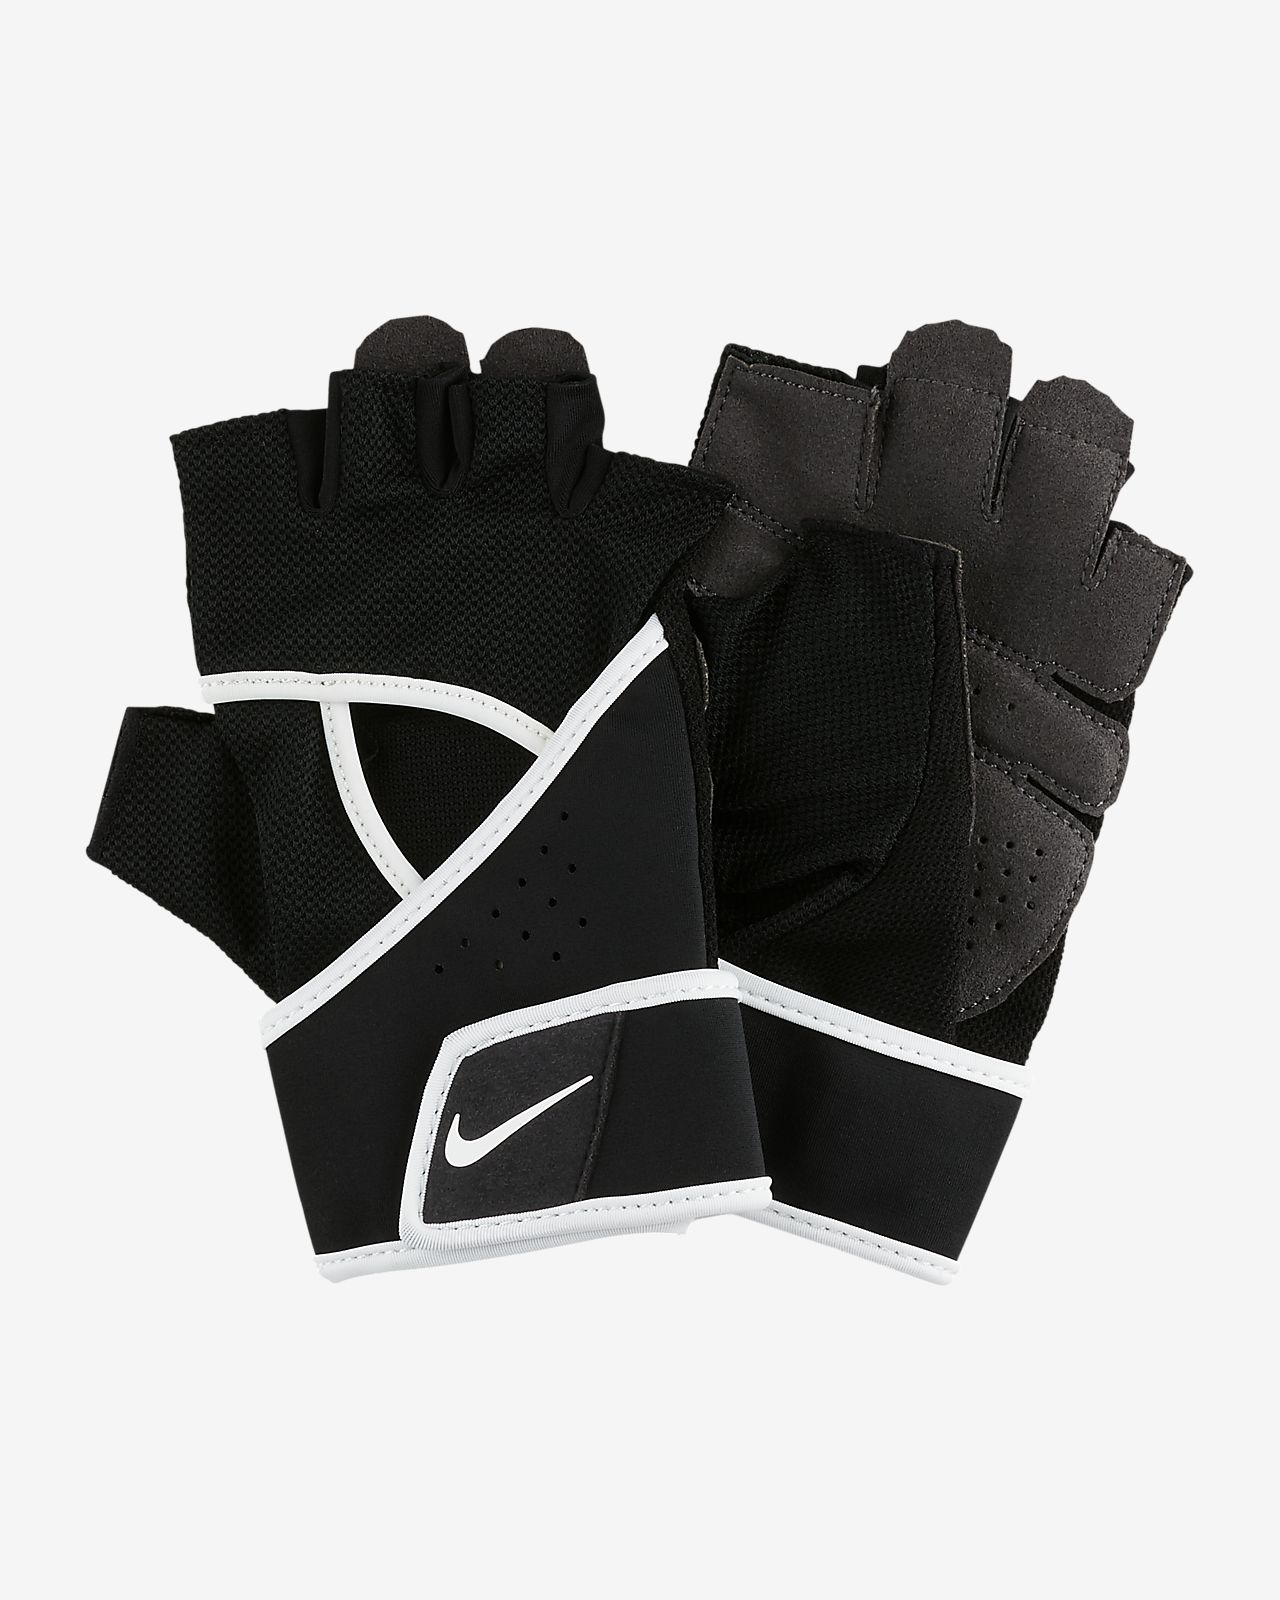 Dámské tréninkové rukavice Nike Gym Premium